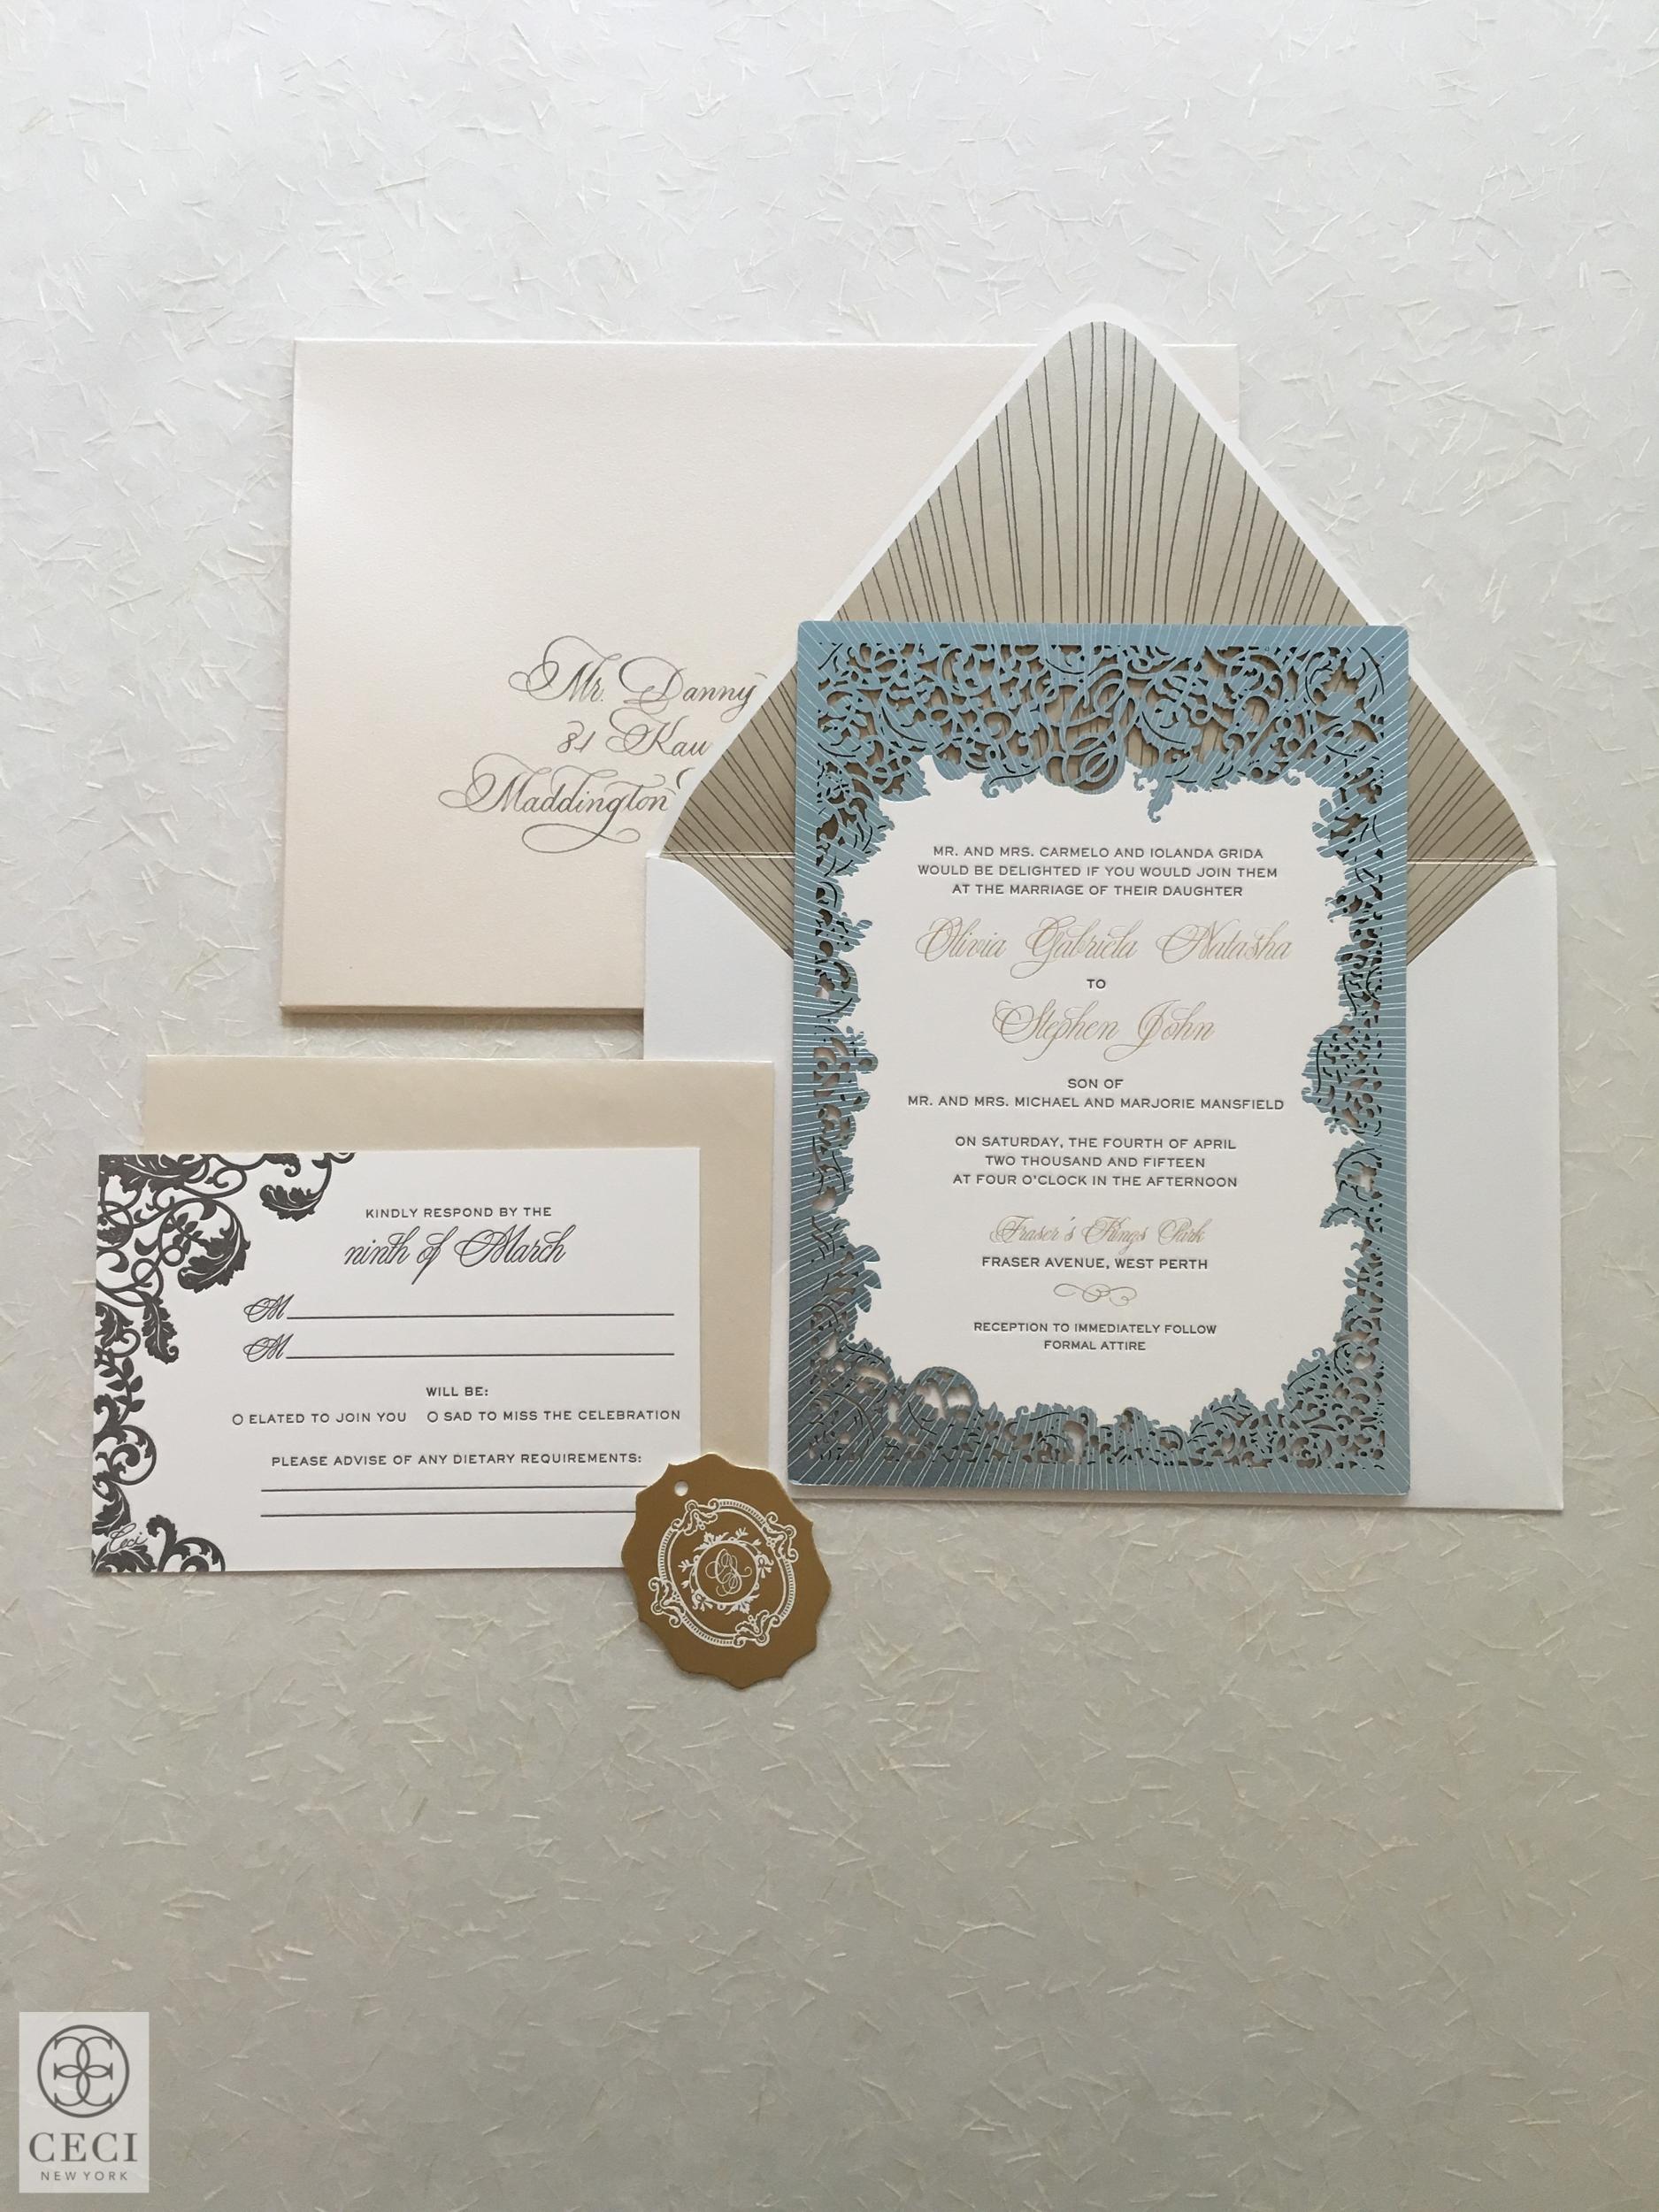 v2Ceci_New_York_Custom_Luxury_Wedding_BeautyShot_LaserCut_Stationery_Personalized_Couture_Foil_Stamping_Perth_Destination_Australia_Chic_.jpg